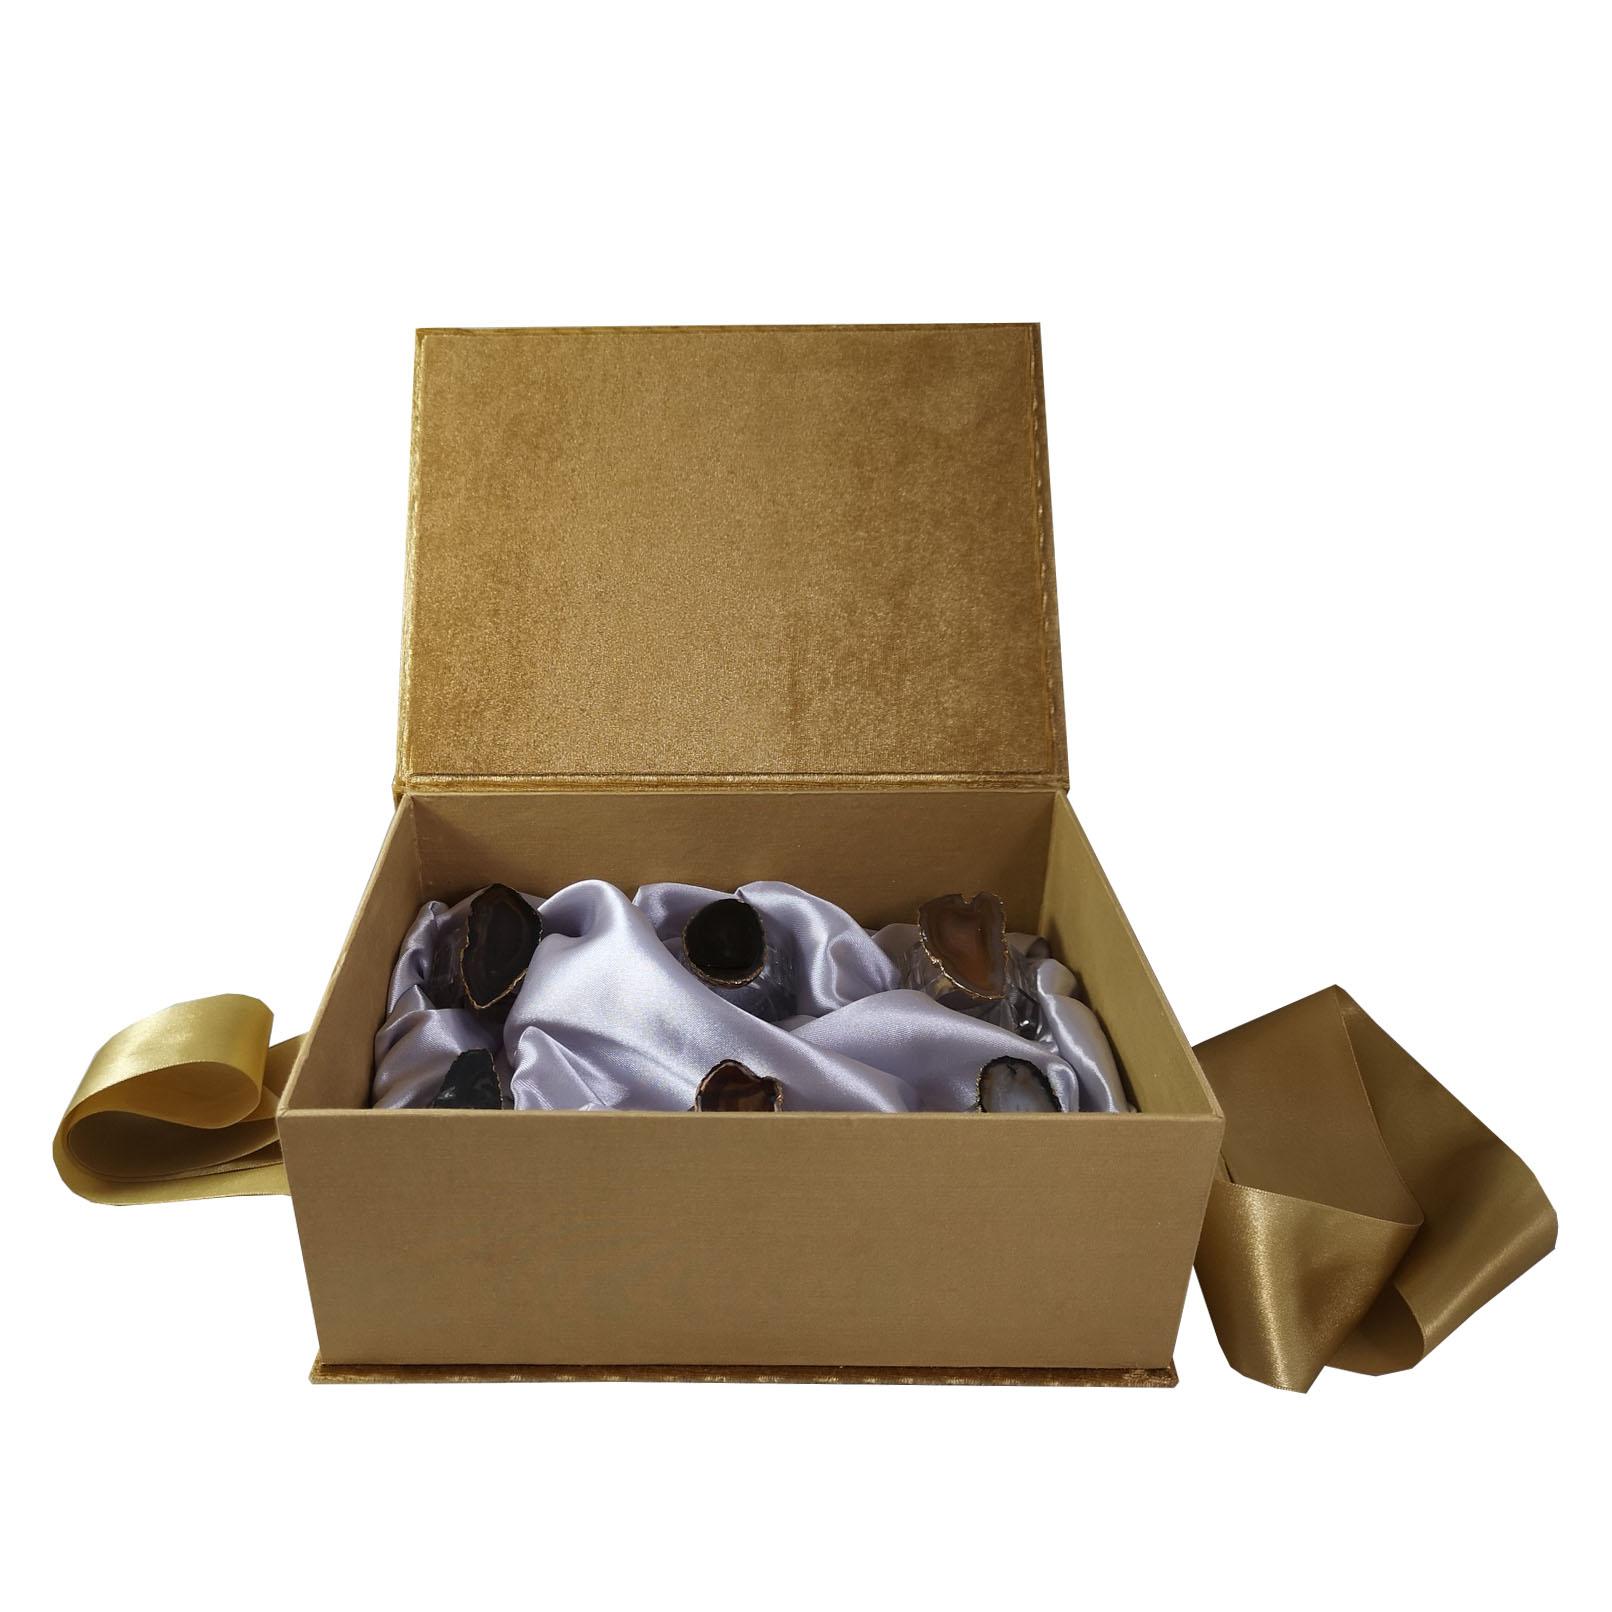 Luxury napkin ring box